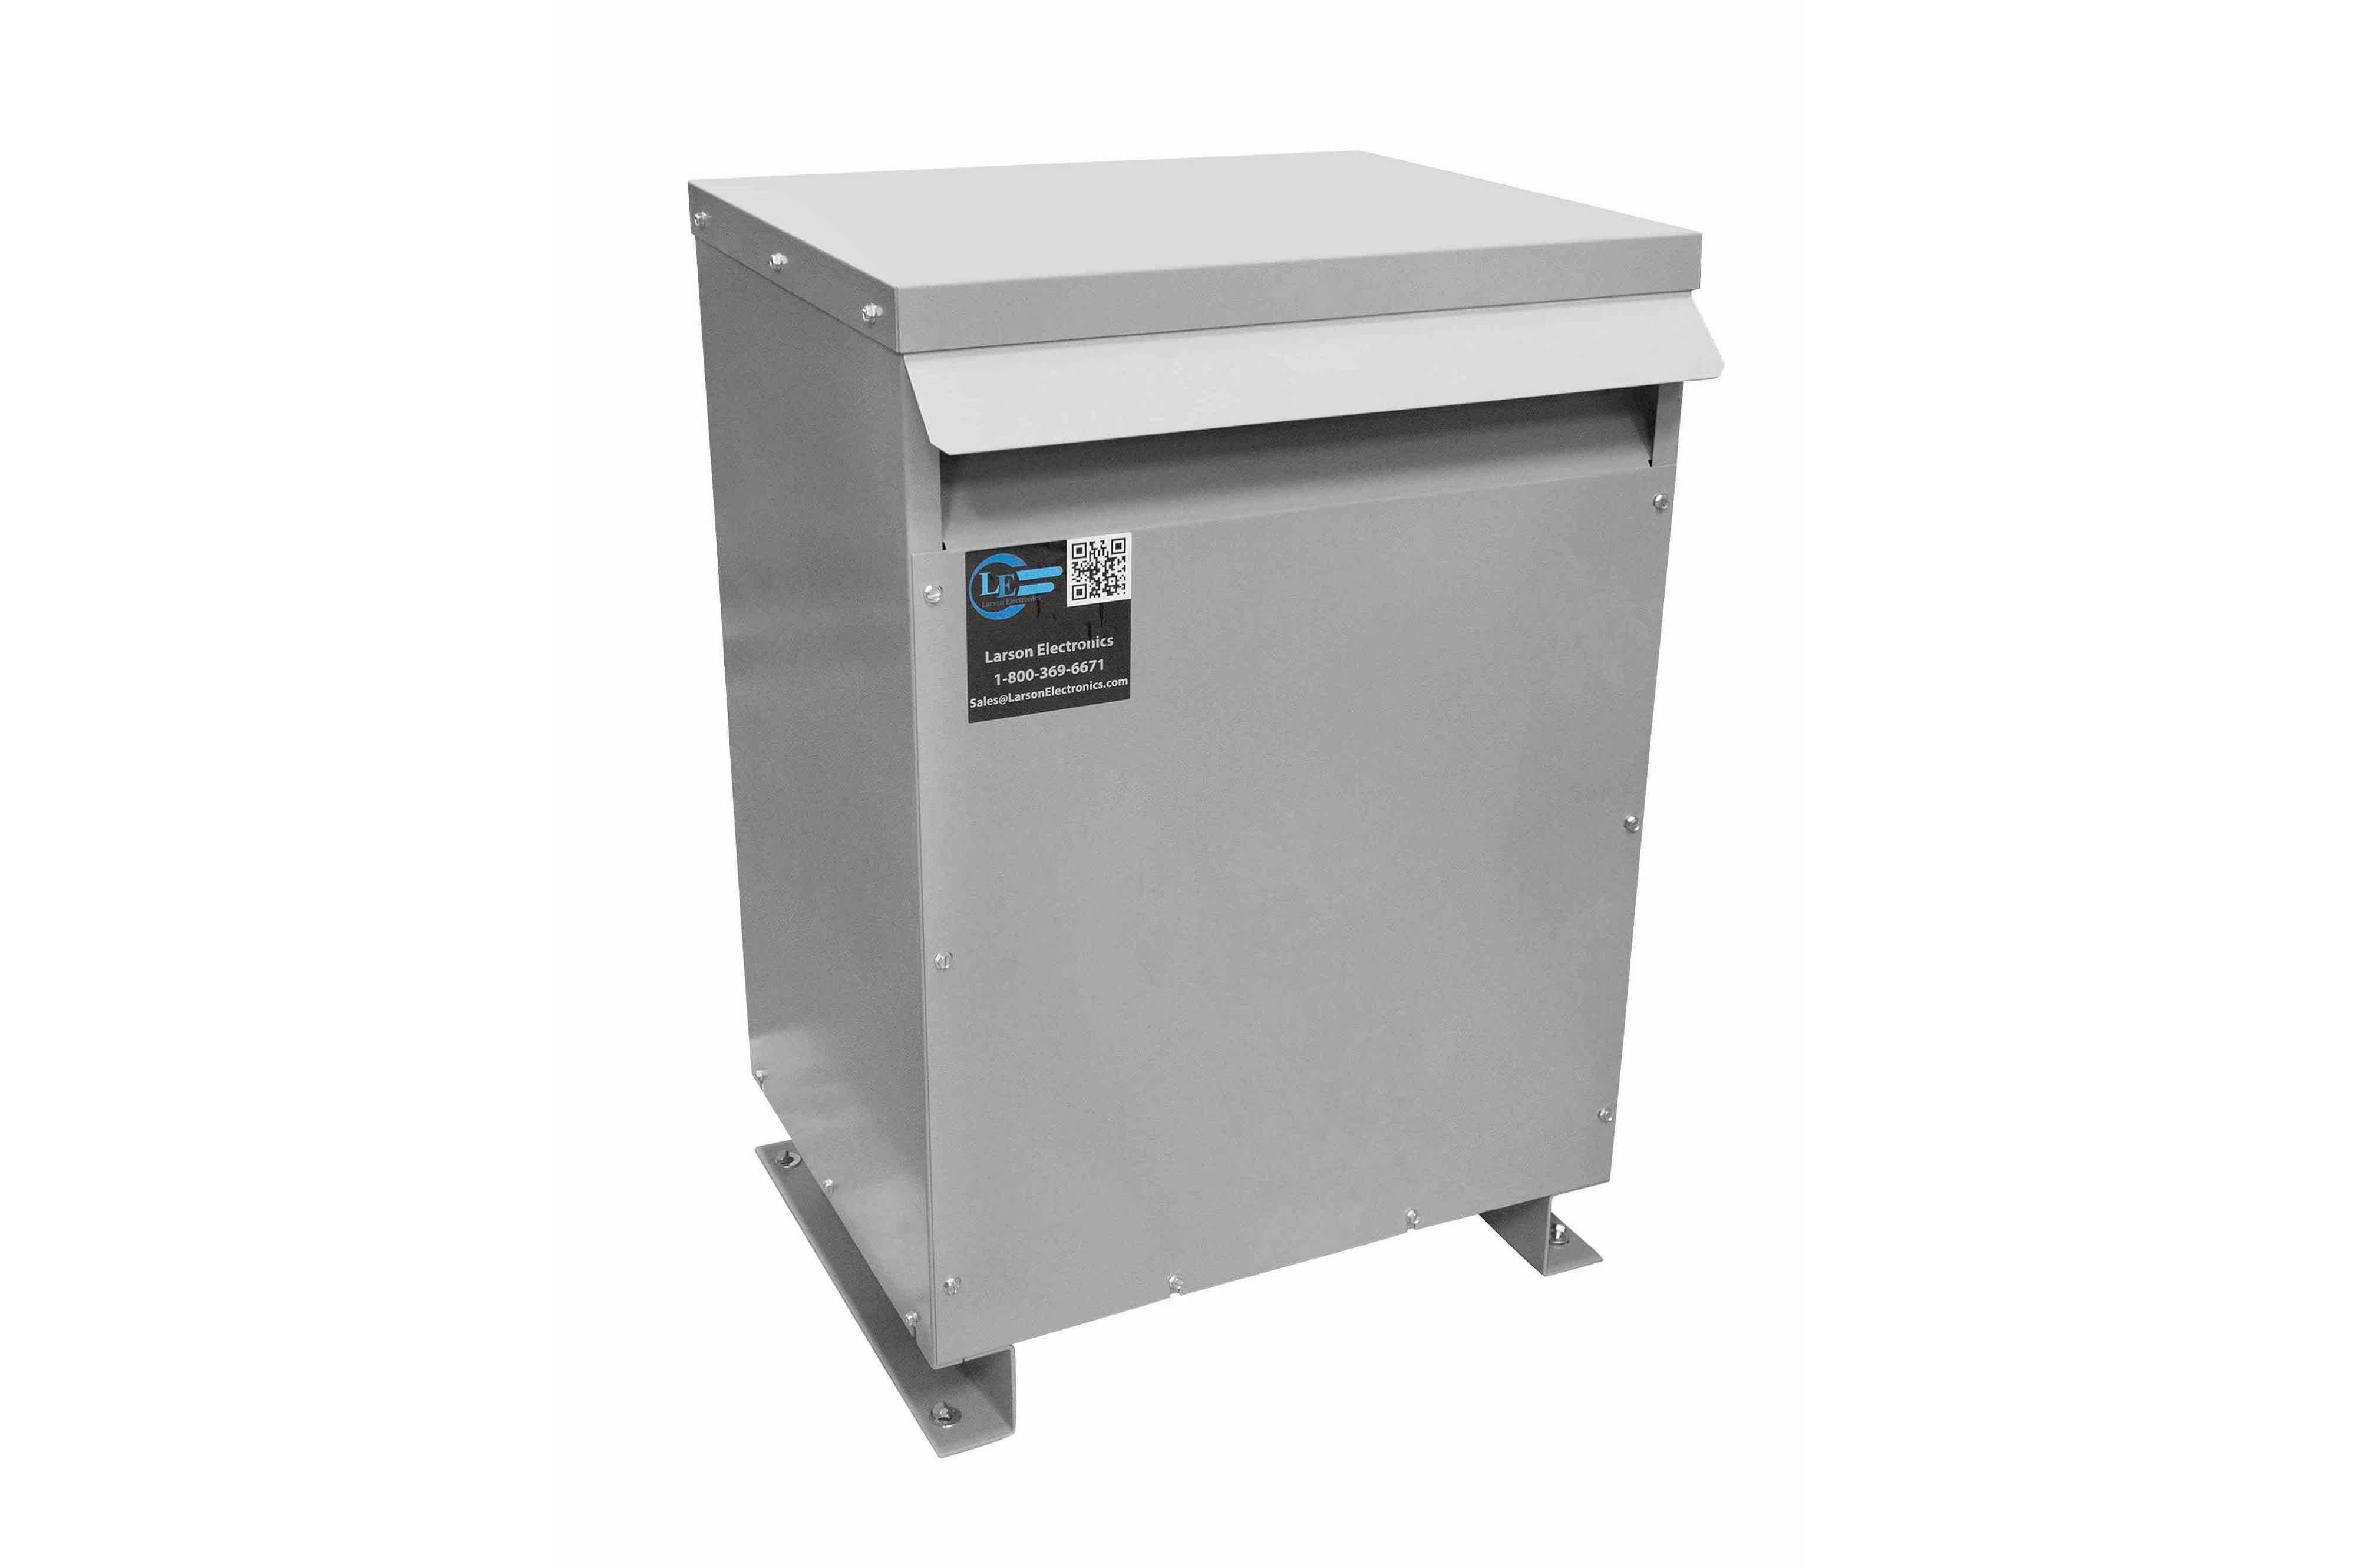 65 kVA 3PH Isolation Transformer, 460V Wye Primary, 380V Delta Secondary, N3R, Ventilated, 60 Hz